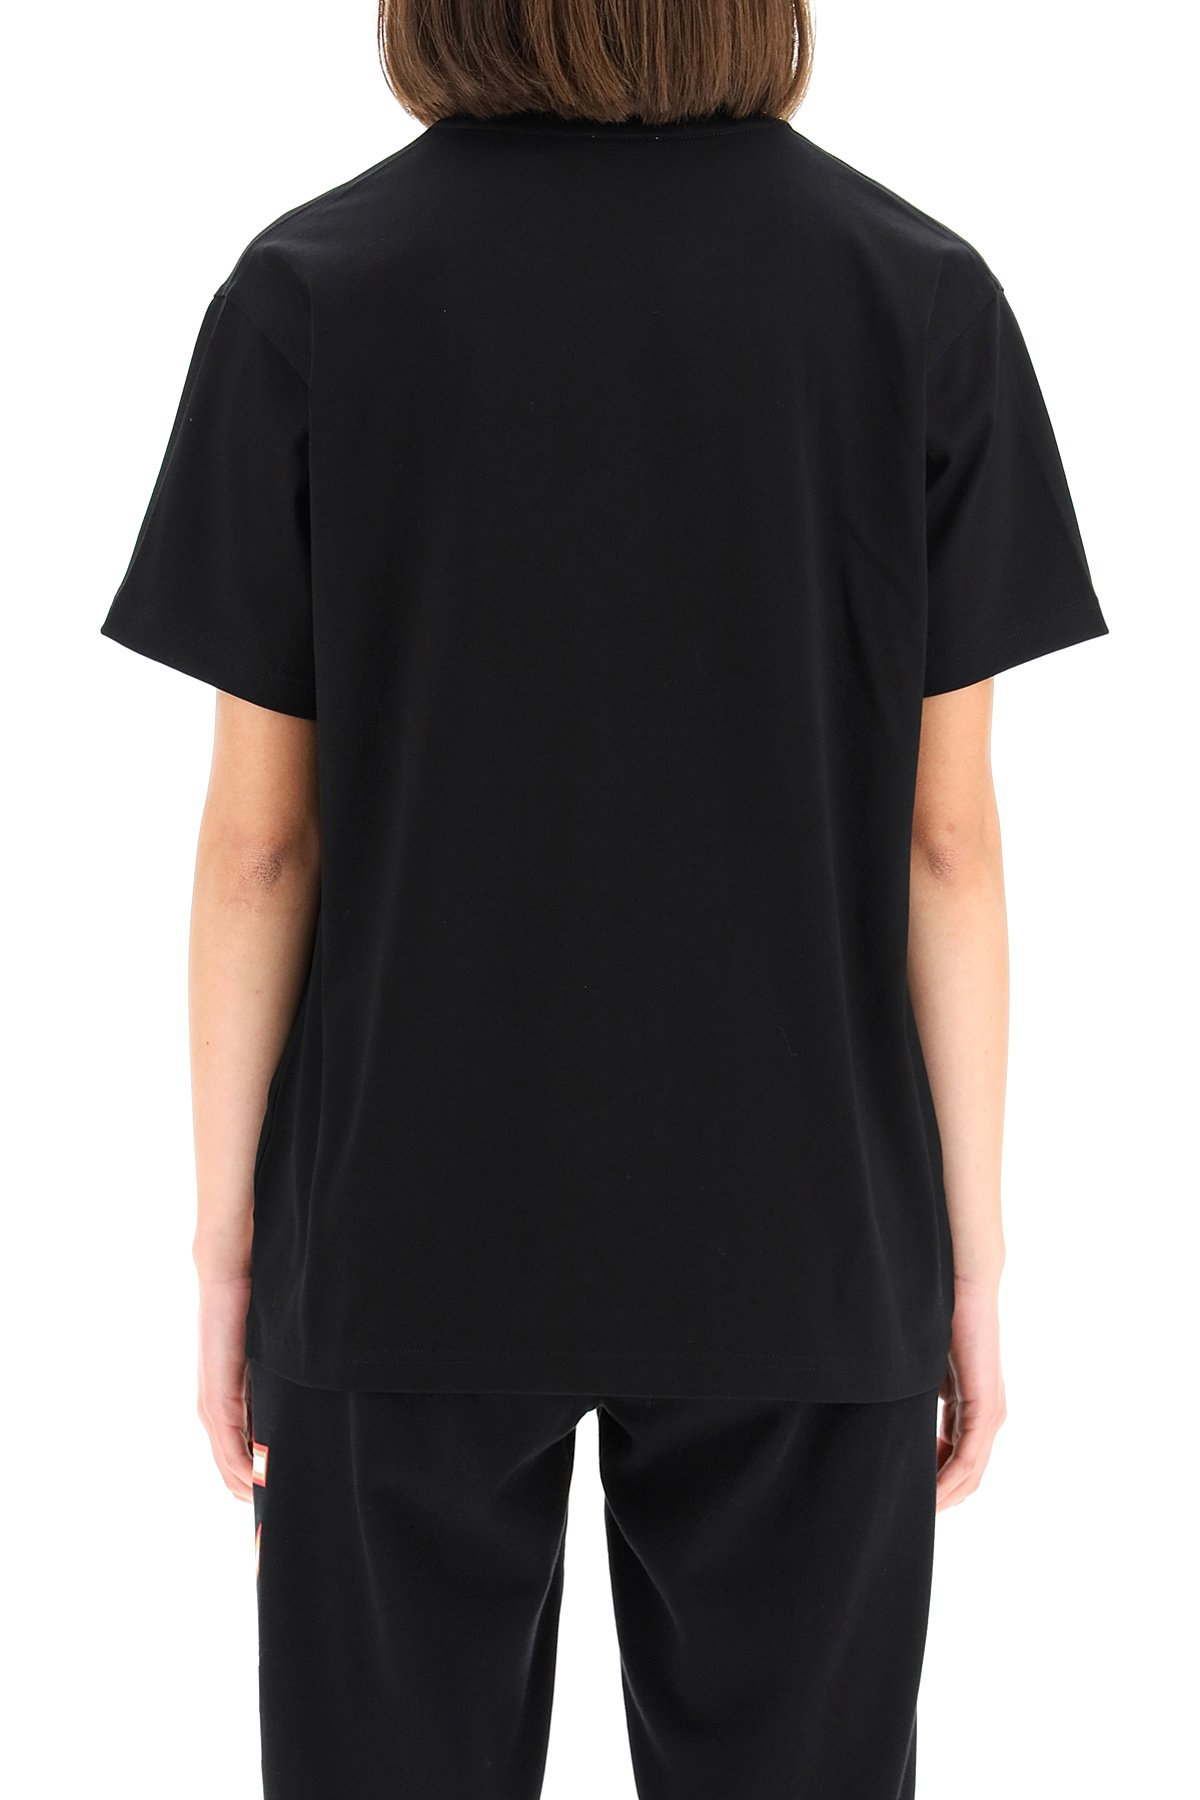 Burberry t-shirt stampa logo